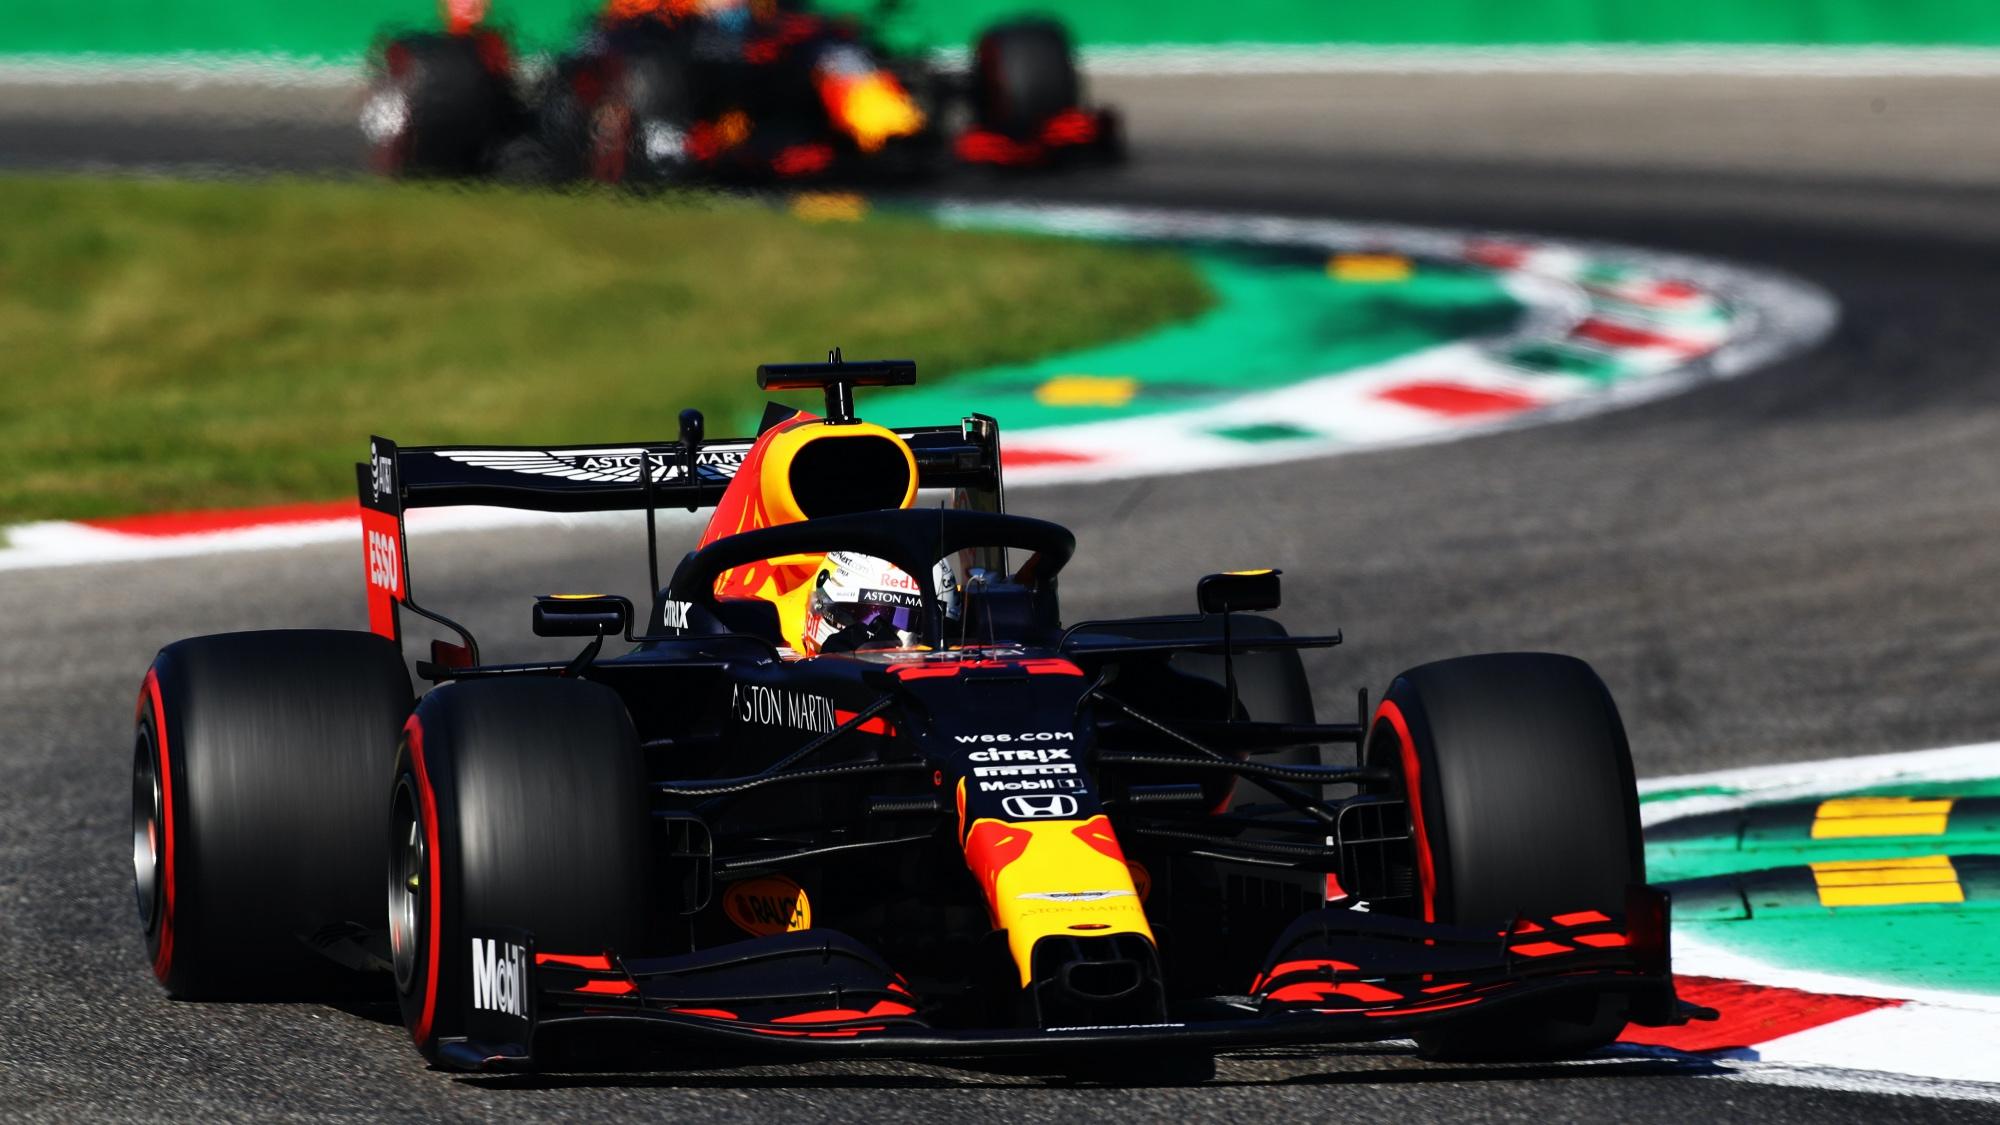 Max Verstappen, 2020 Italian GP